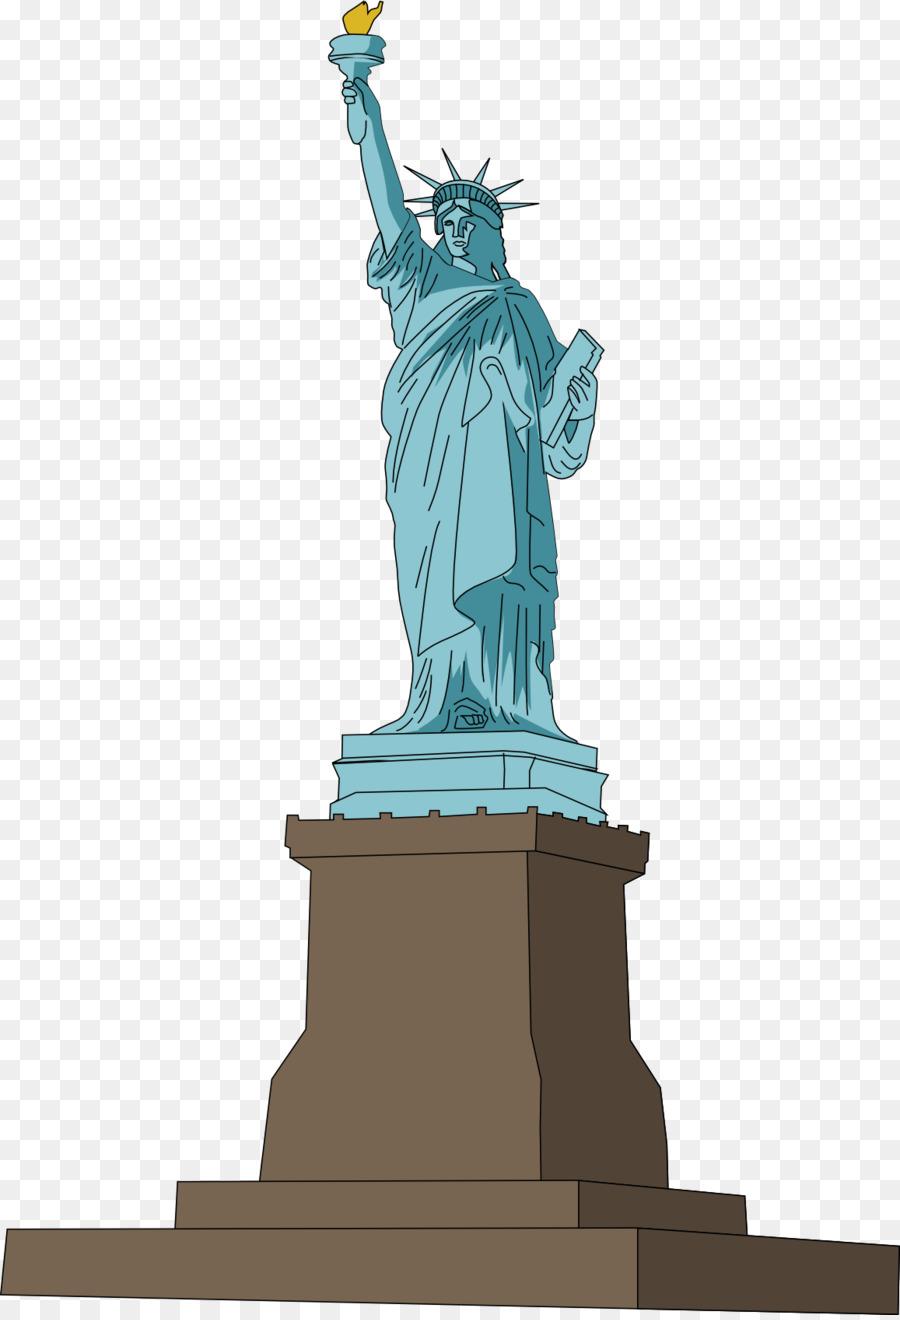 Statue Of Liberty Cartoon.